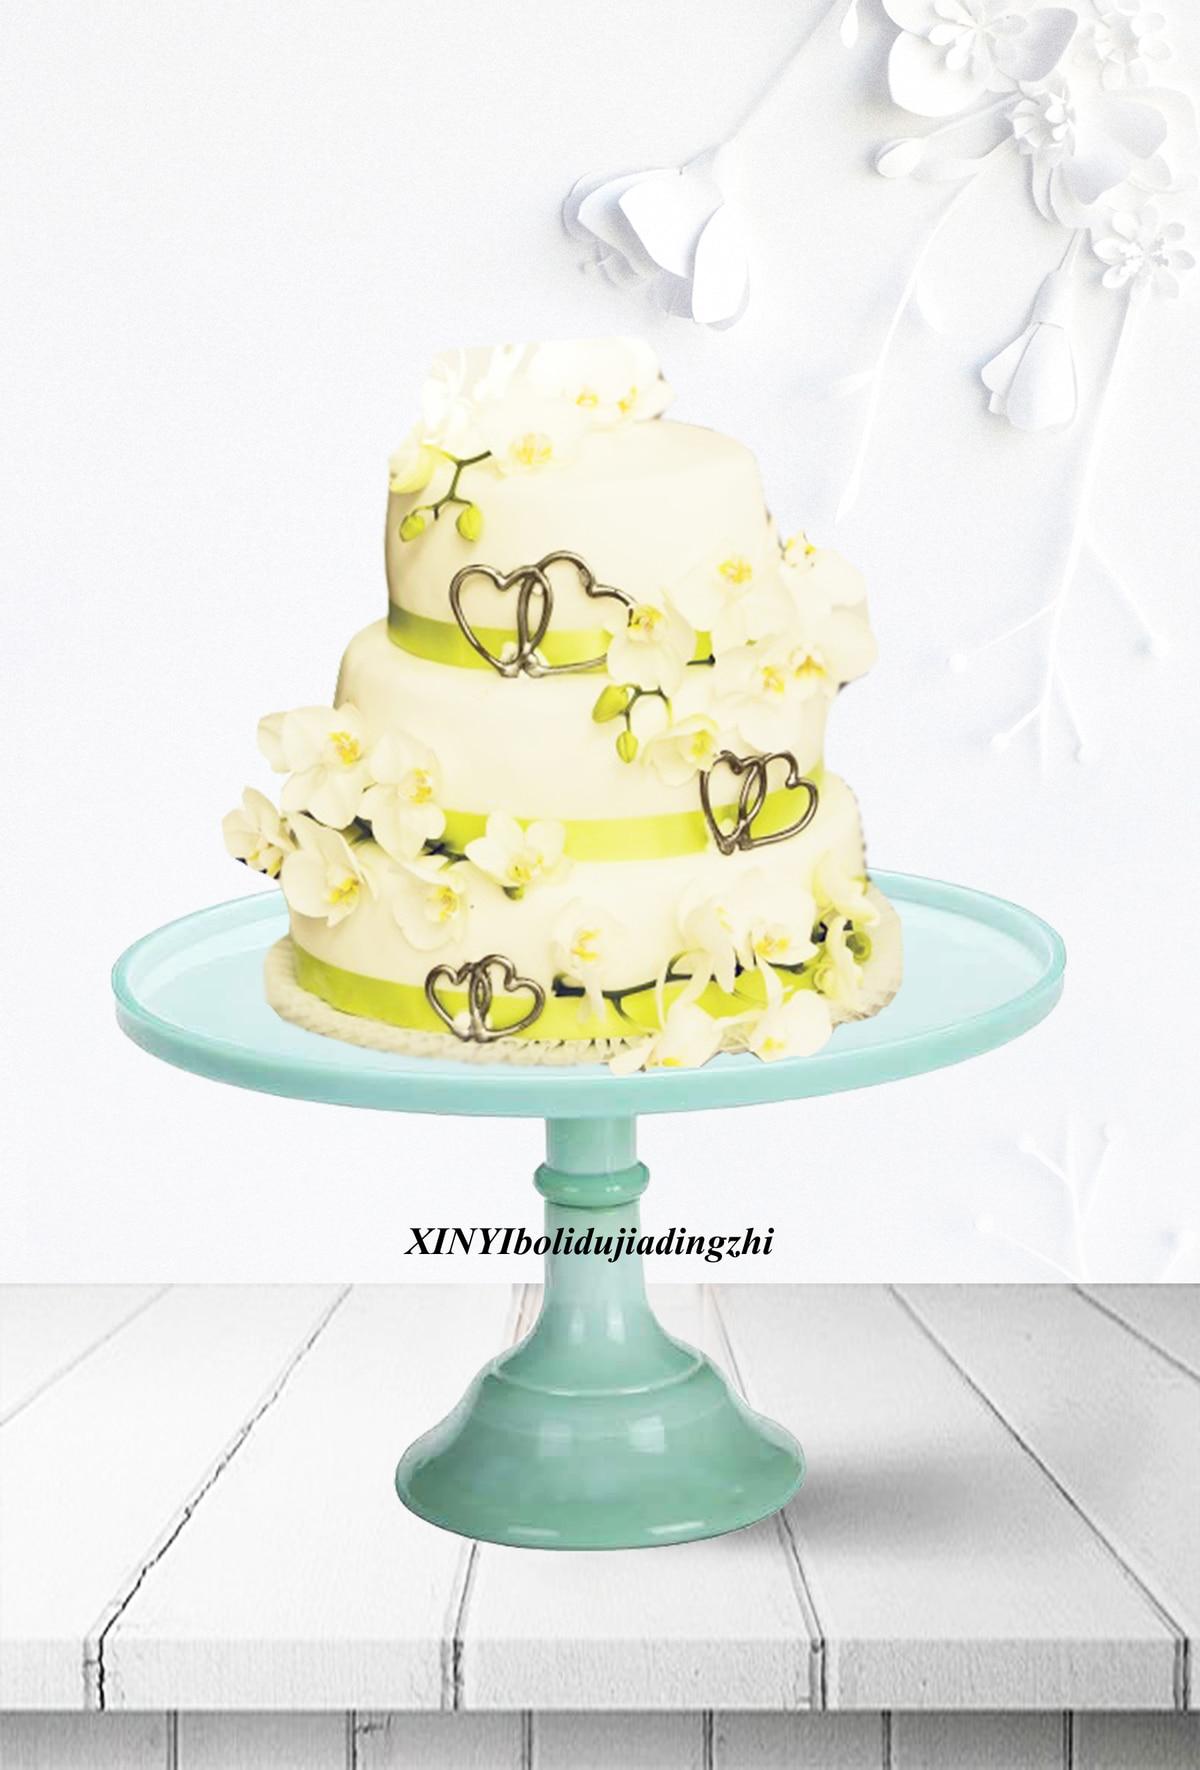 green milk glass cake plate stand fireking style wedding fondant ...